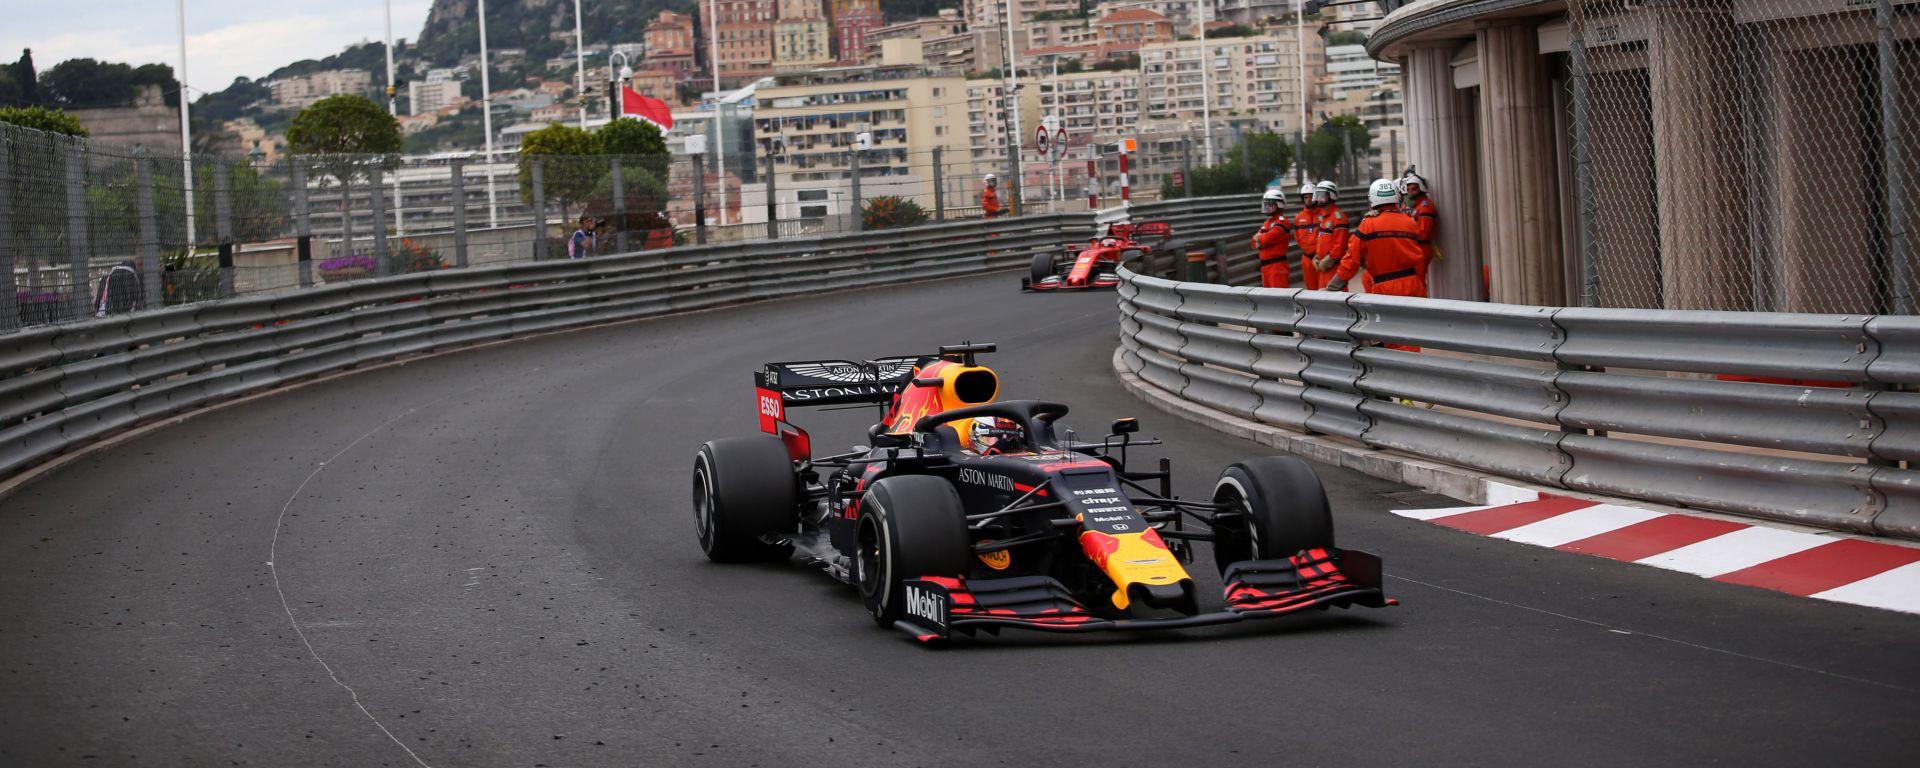 Verstappen in pista a Monaco